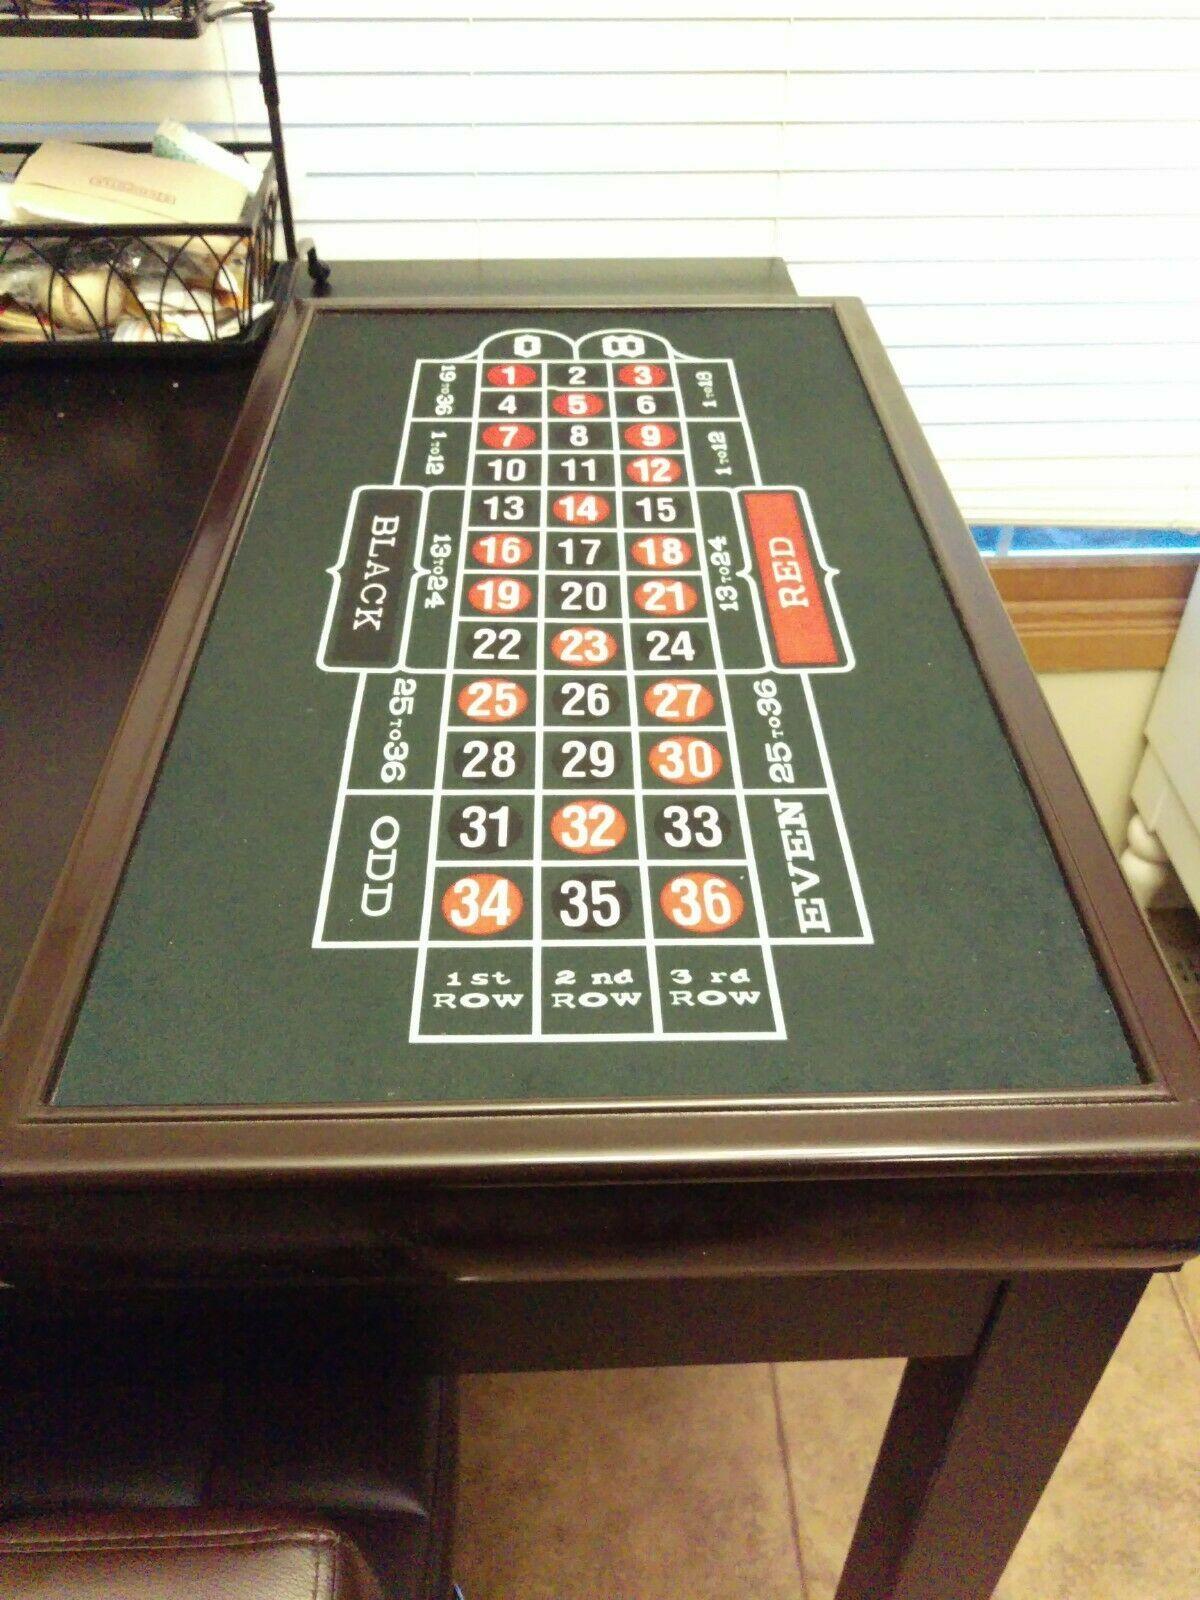 Rake It In Casino Night Table Top Blackjack Roulette Craps Table W Poker Chips Casino Table Games Poker Chips Blackjack